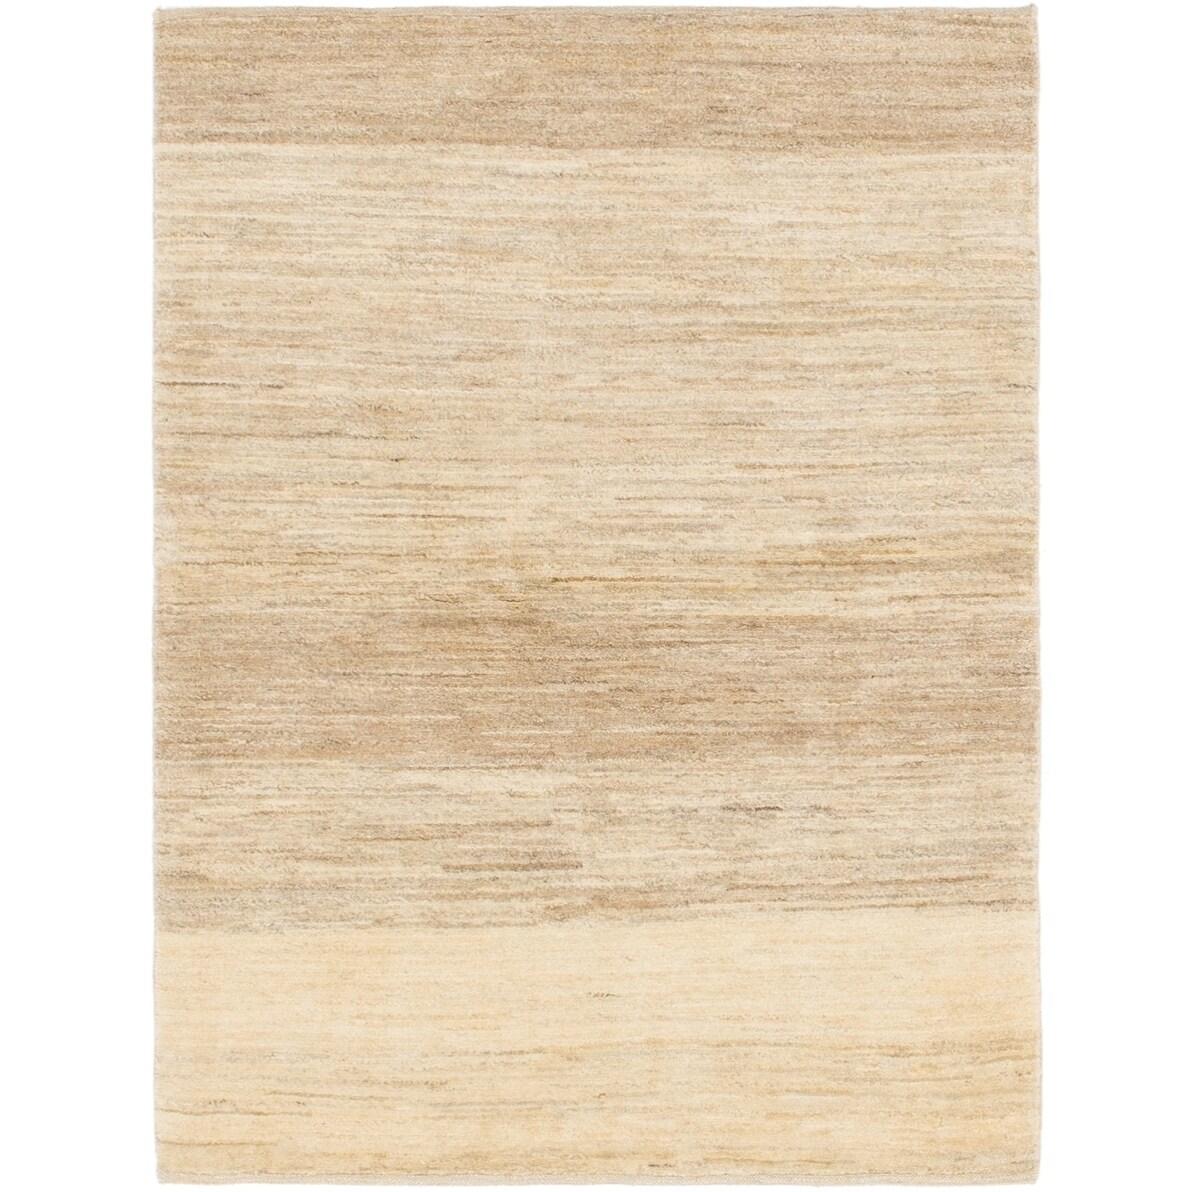 Hand Knotted Kashkuli Gabbeh Wool Area Rug - 3 4 x 4 7 (Cream - 3 4 x 4 7)